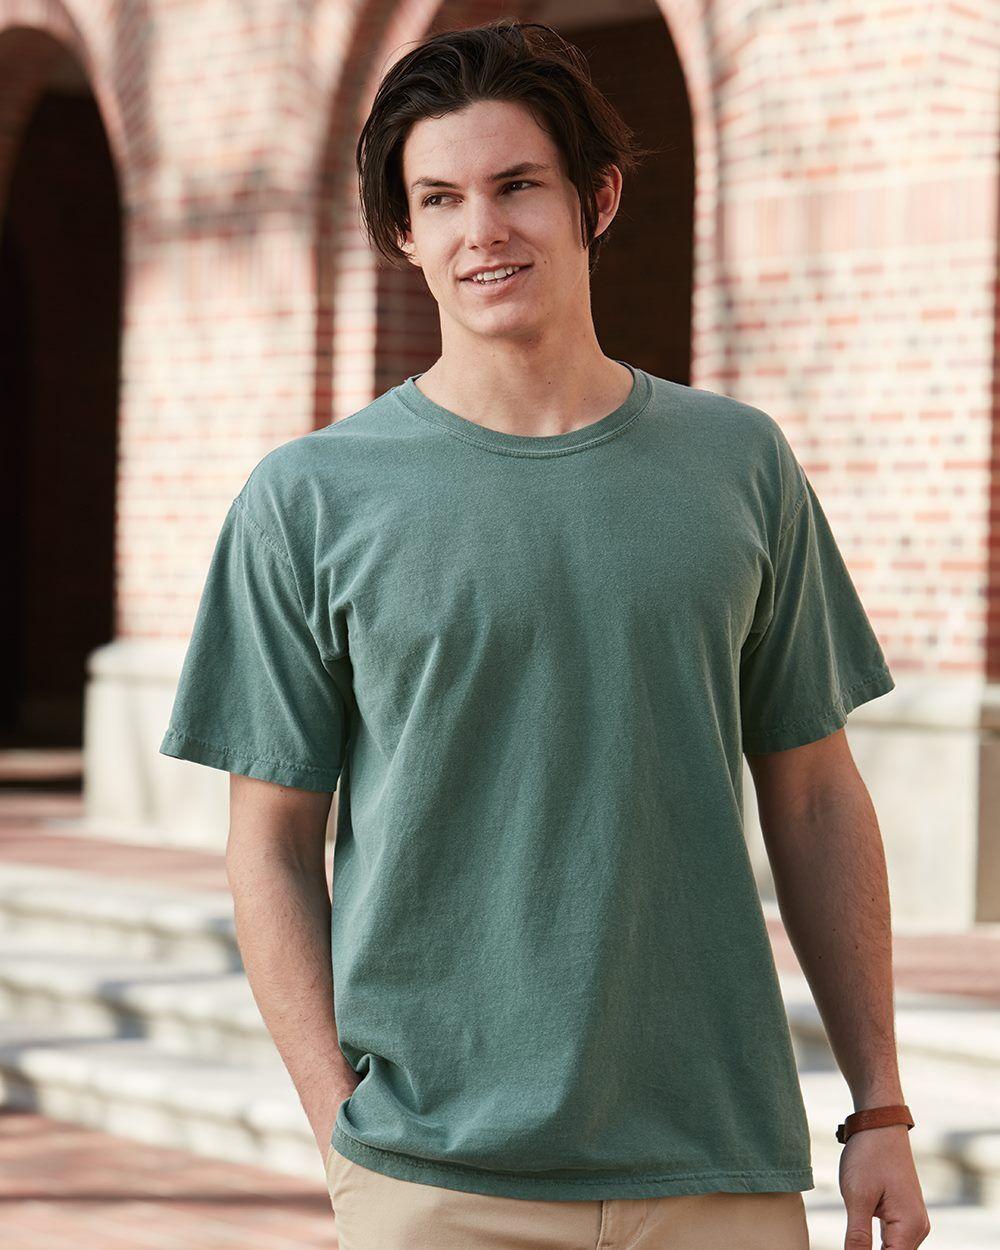 12 Comfort Farbes Garment Dye T-Shirt Wholesale Bulk Lot ok to mix S-XL & Farbes